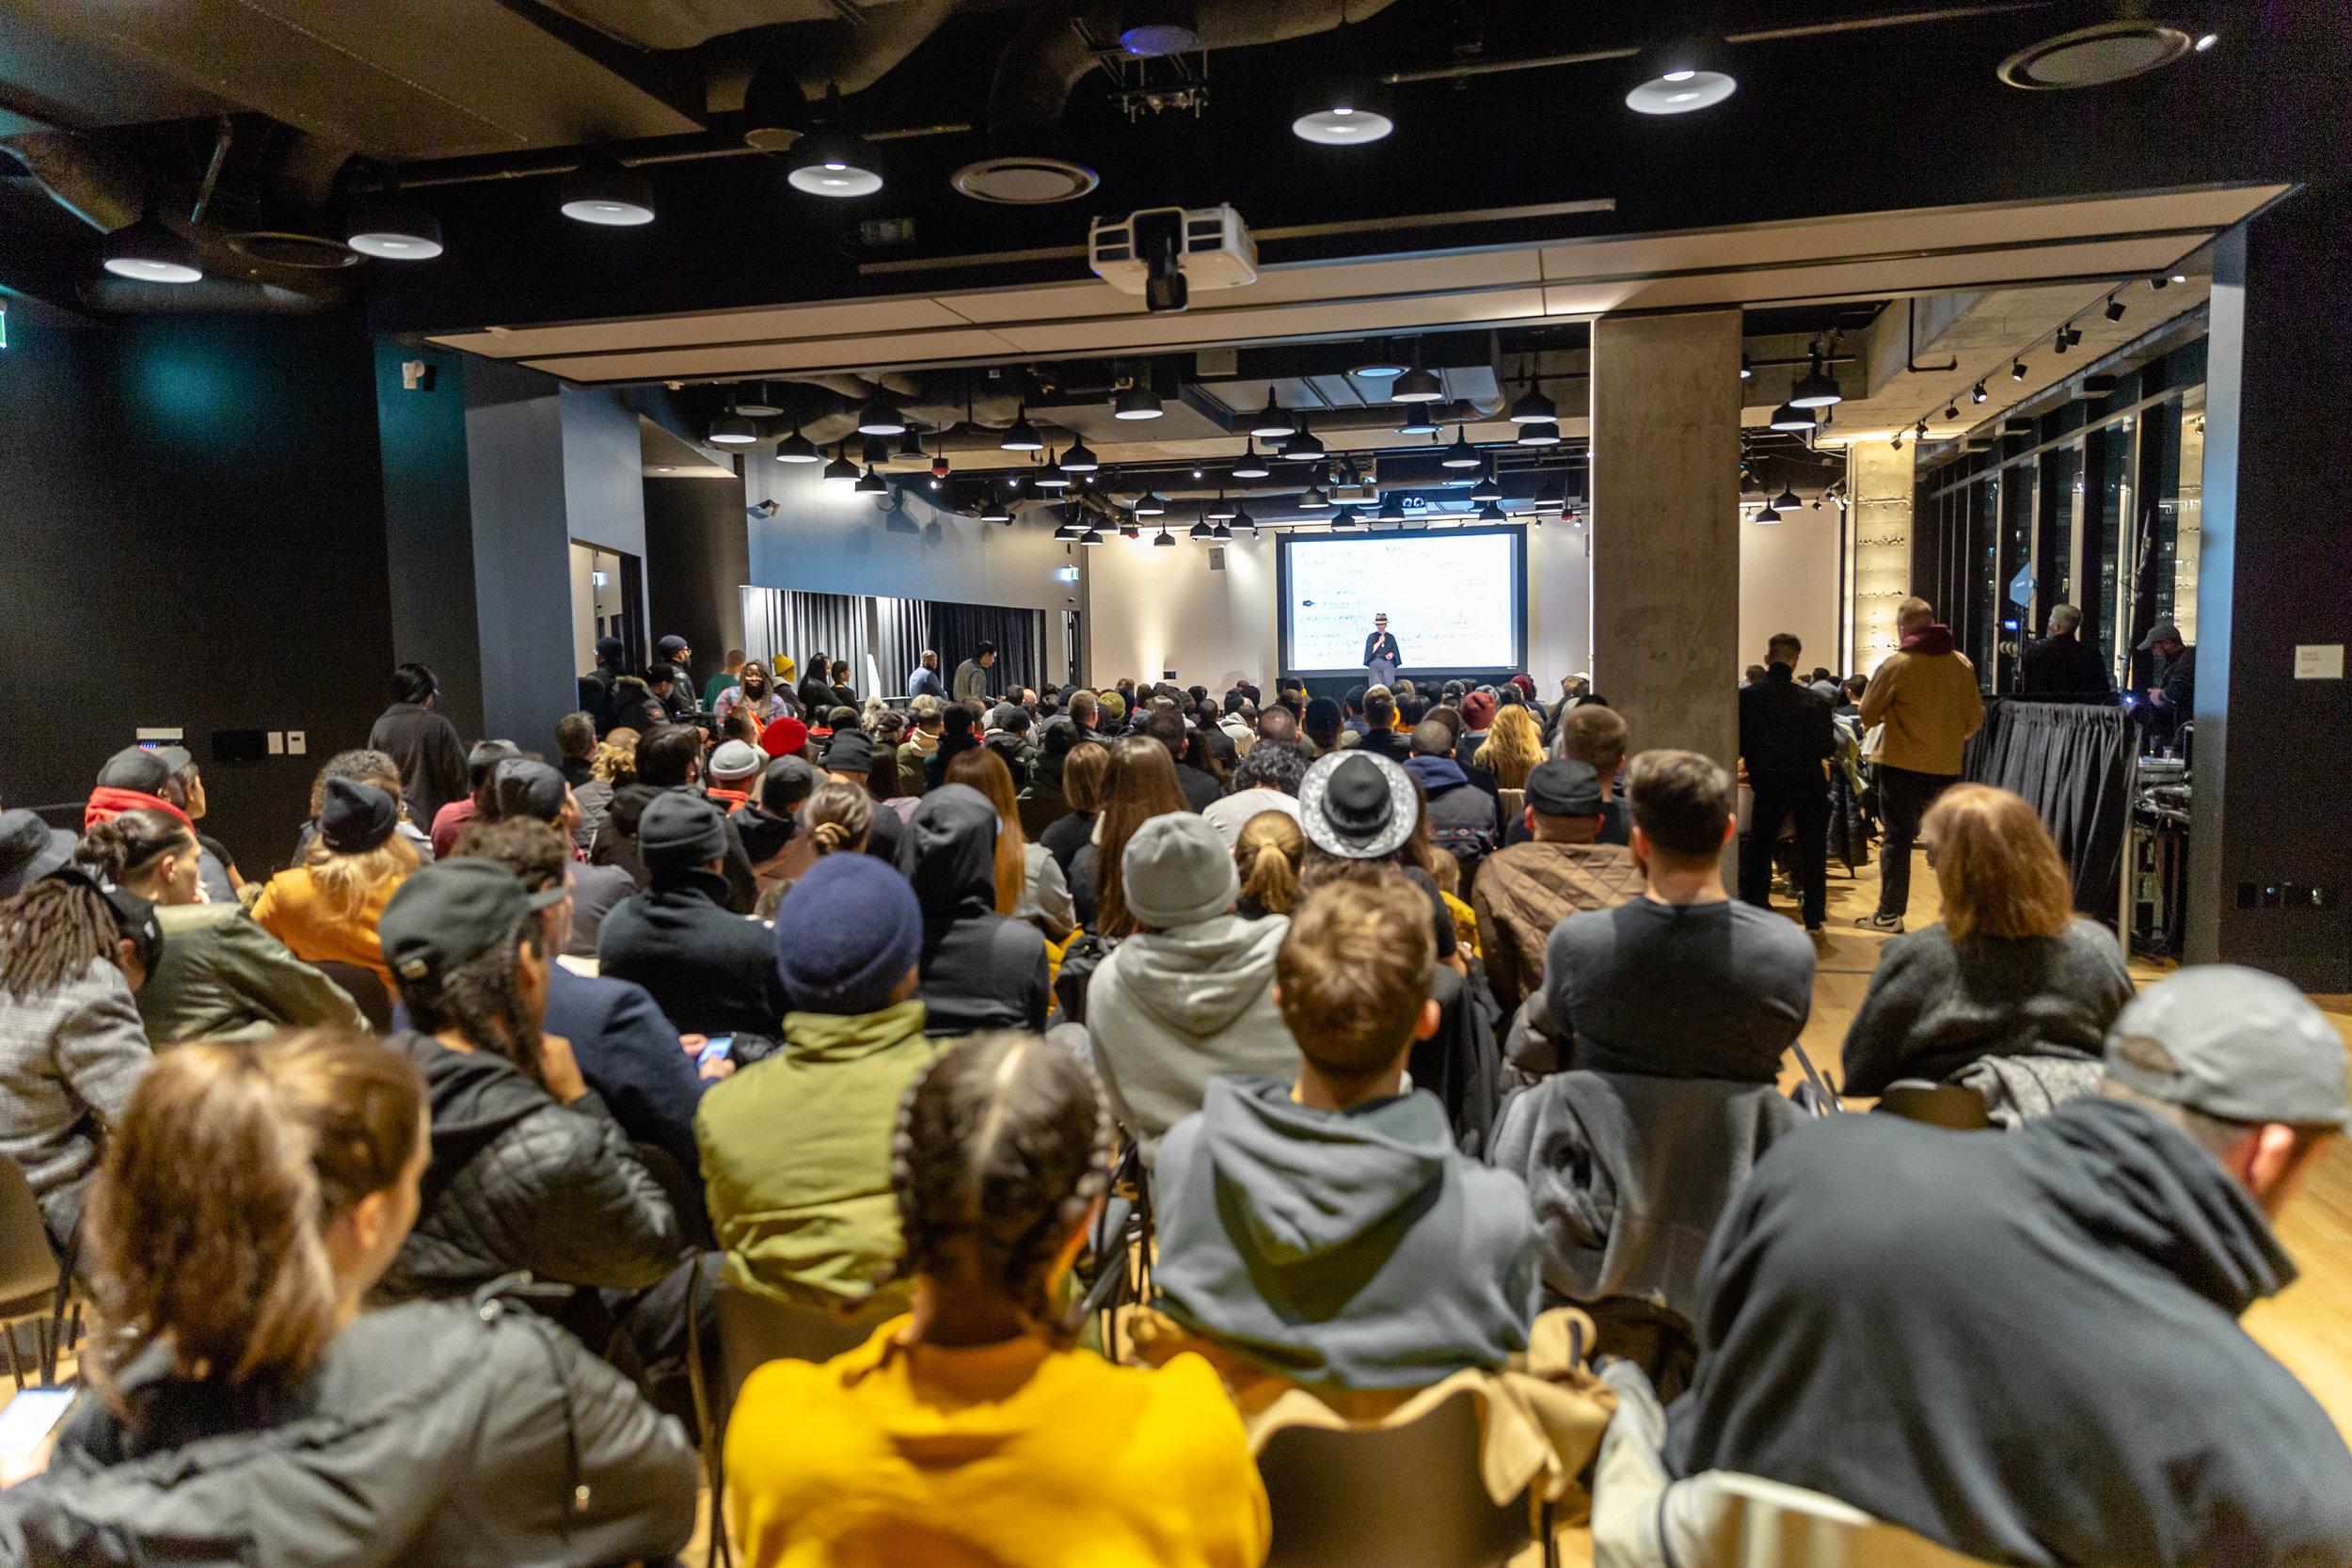 One of the many talks at Daniels Launchpad. Image Credit: Vito Amati / Ryan Emberley / Artscape Daniels Launchpad.